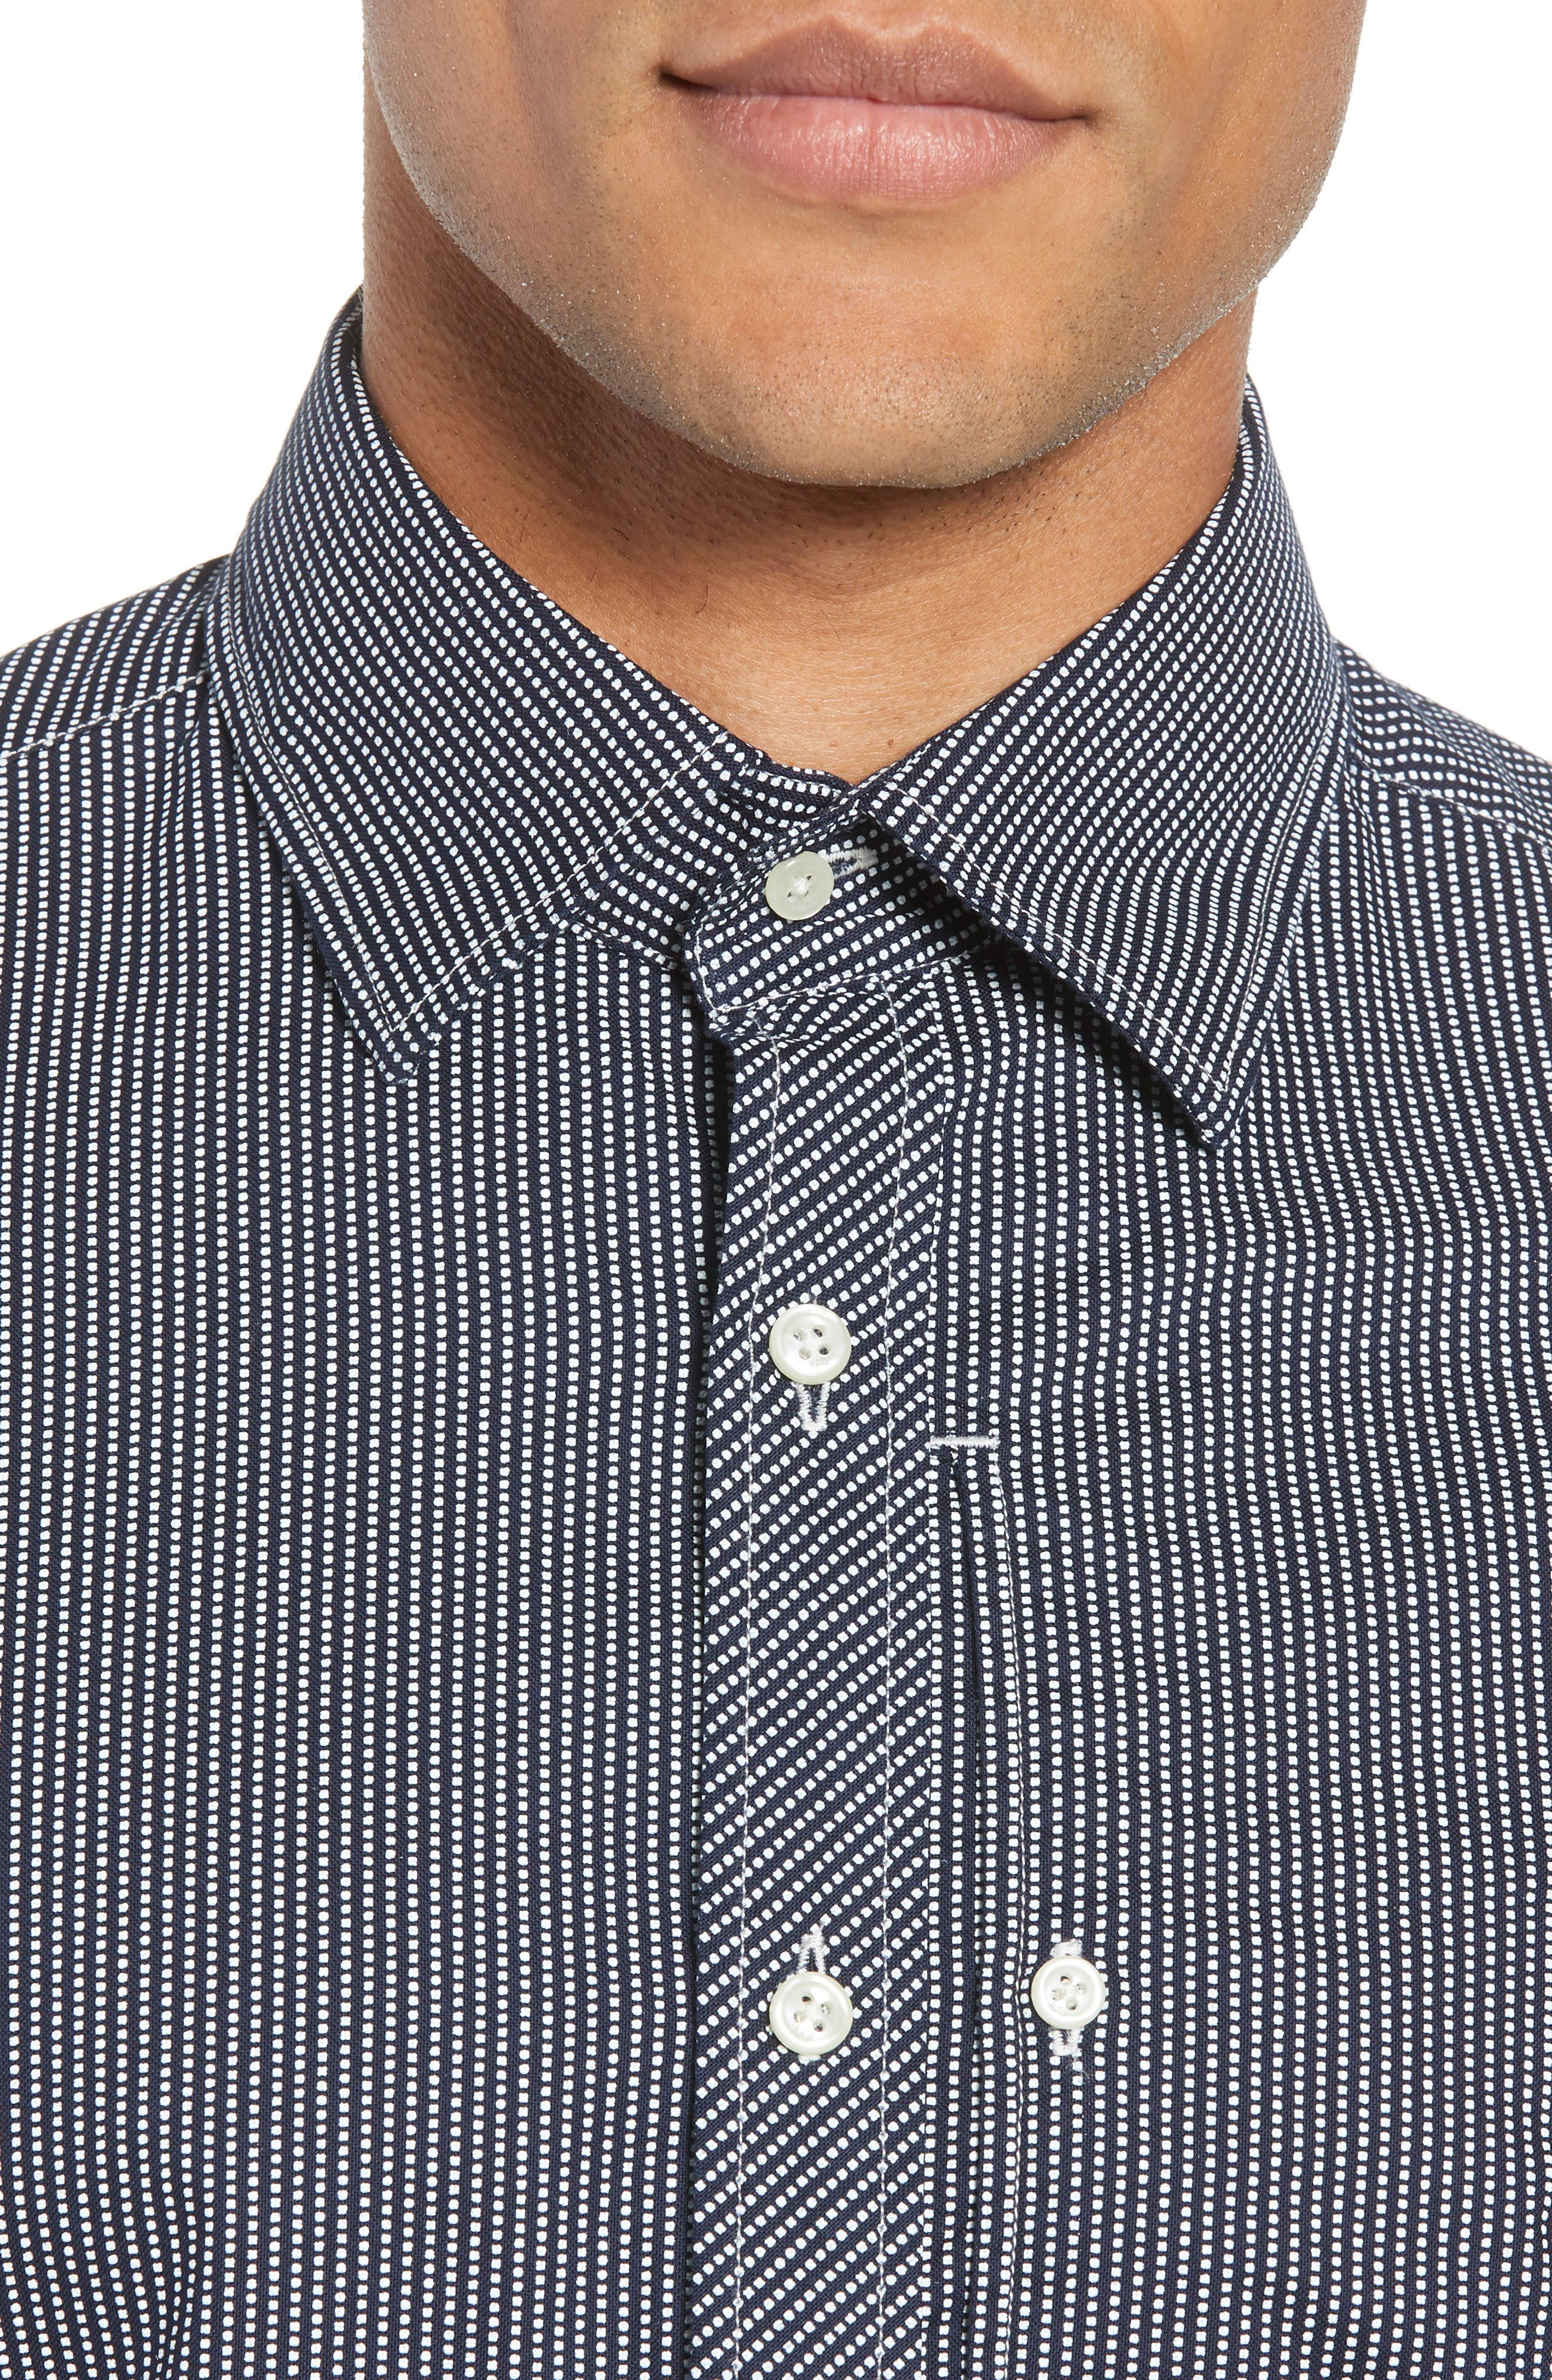 Bristum Straight Ref Shirt,                             Alternate thumbnail 4, color,                             400